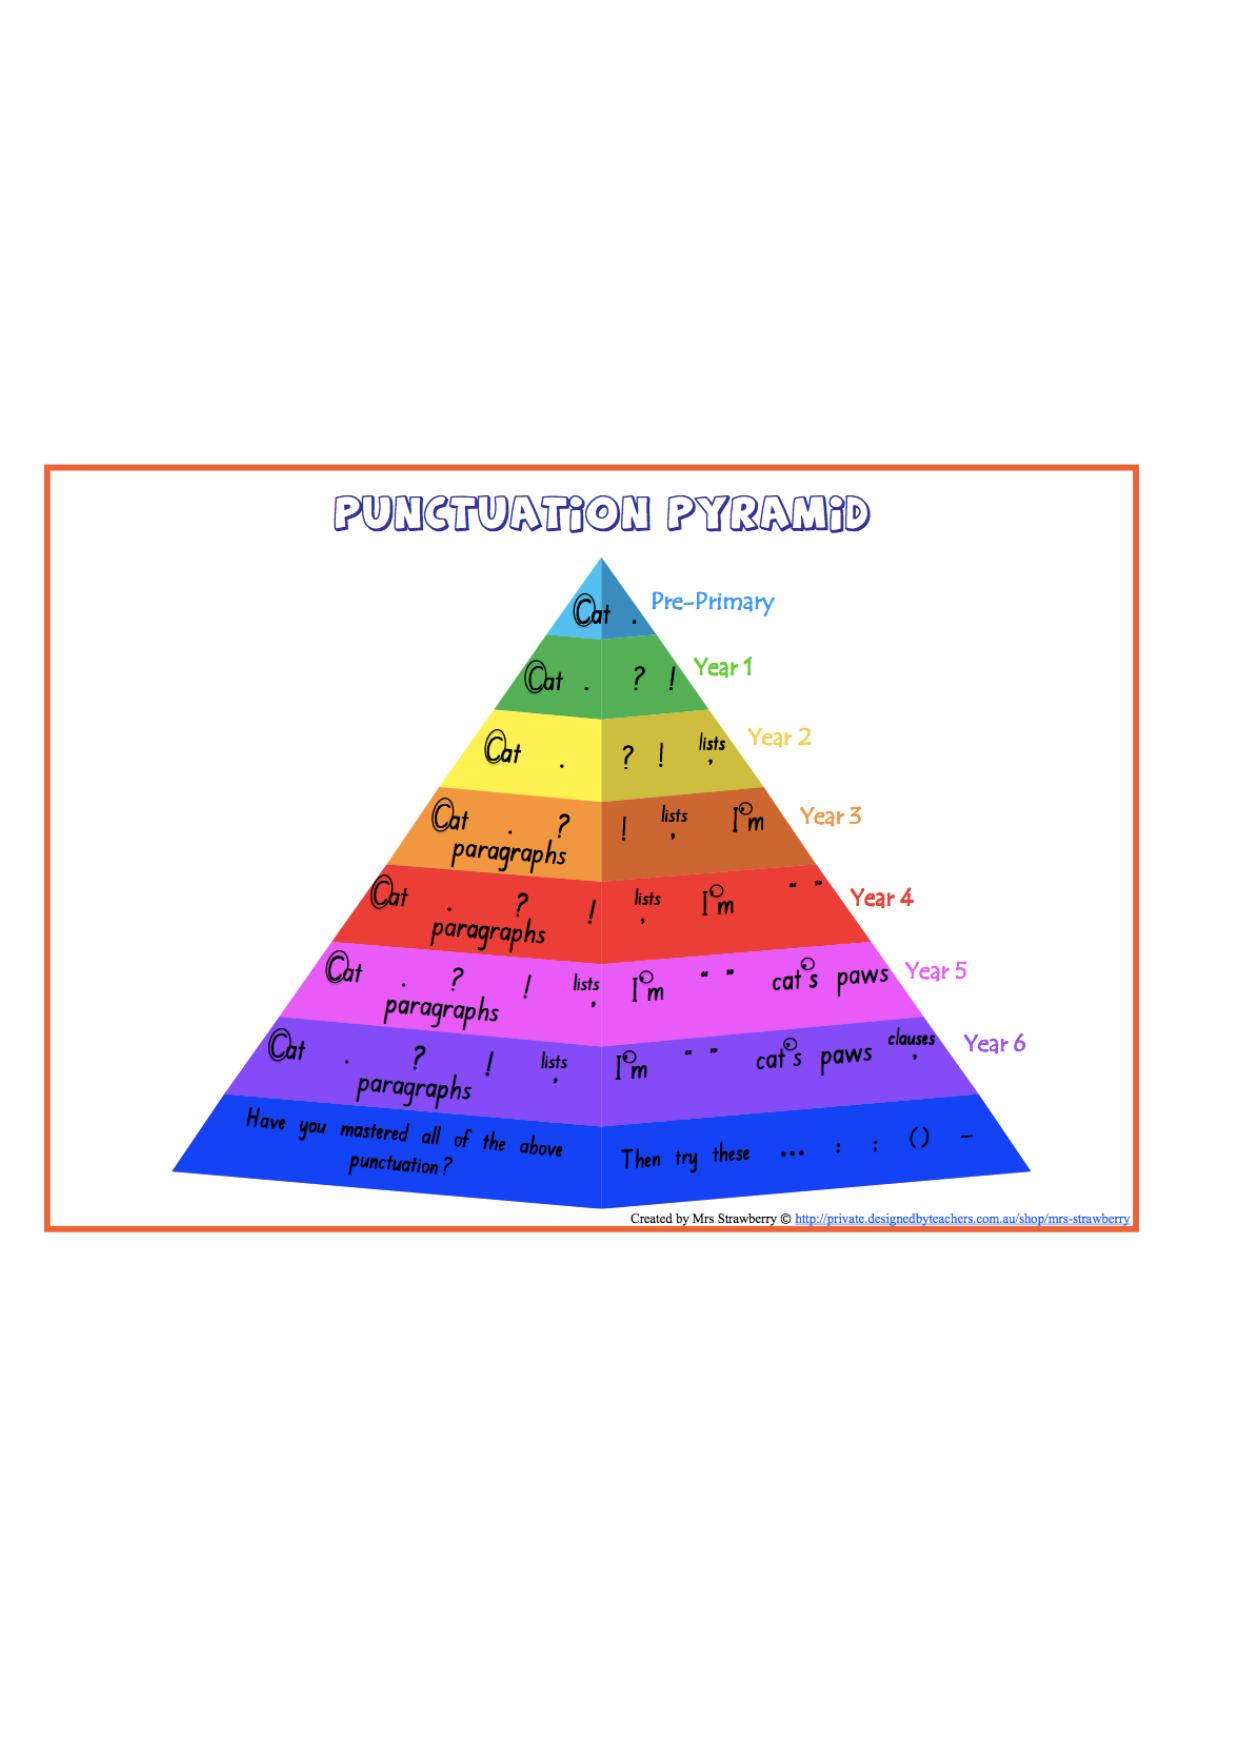 Australian Curriculum Punctuation Pyramid Dbt Year 3